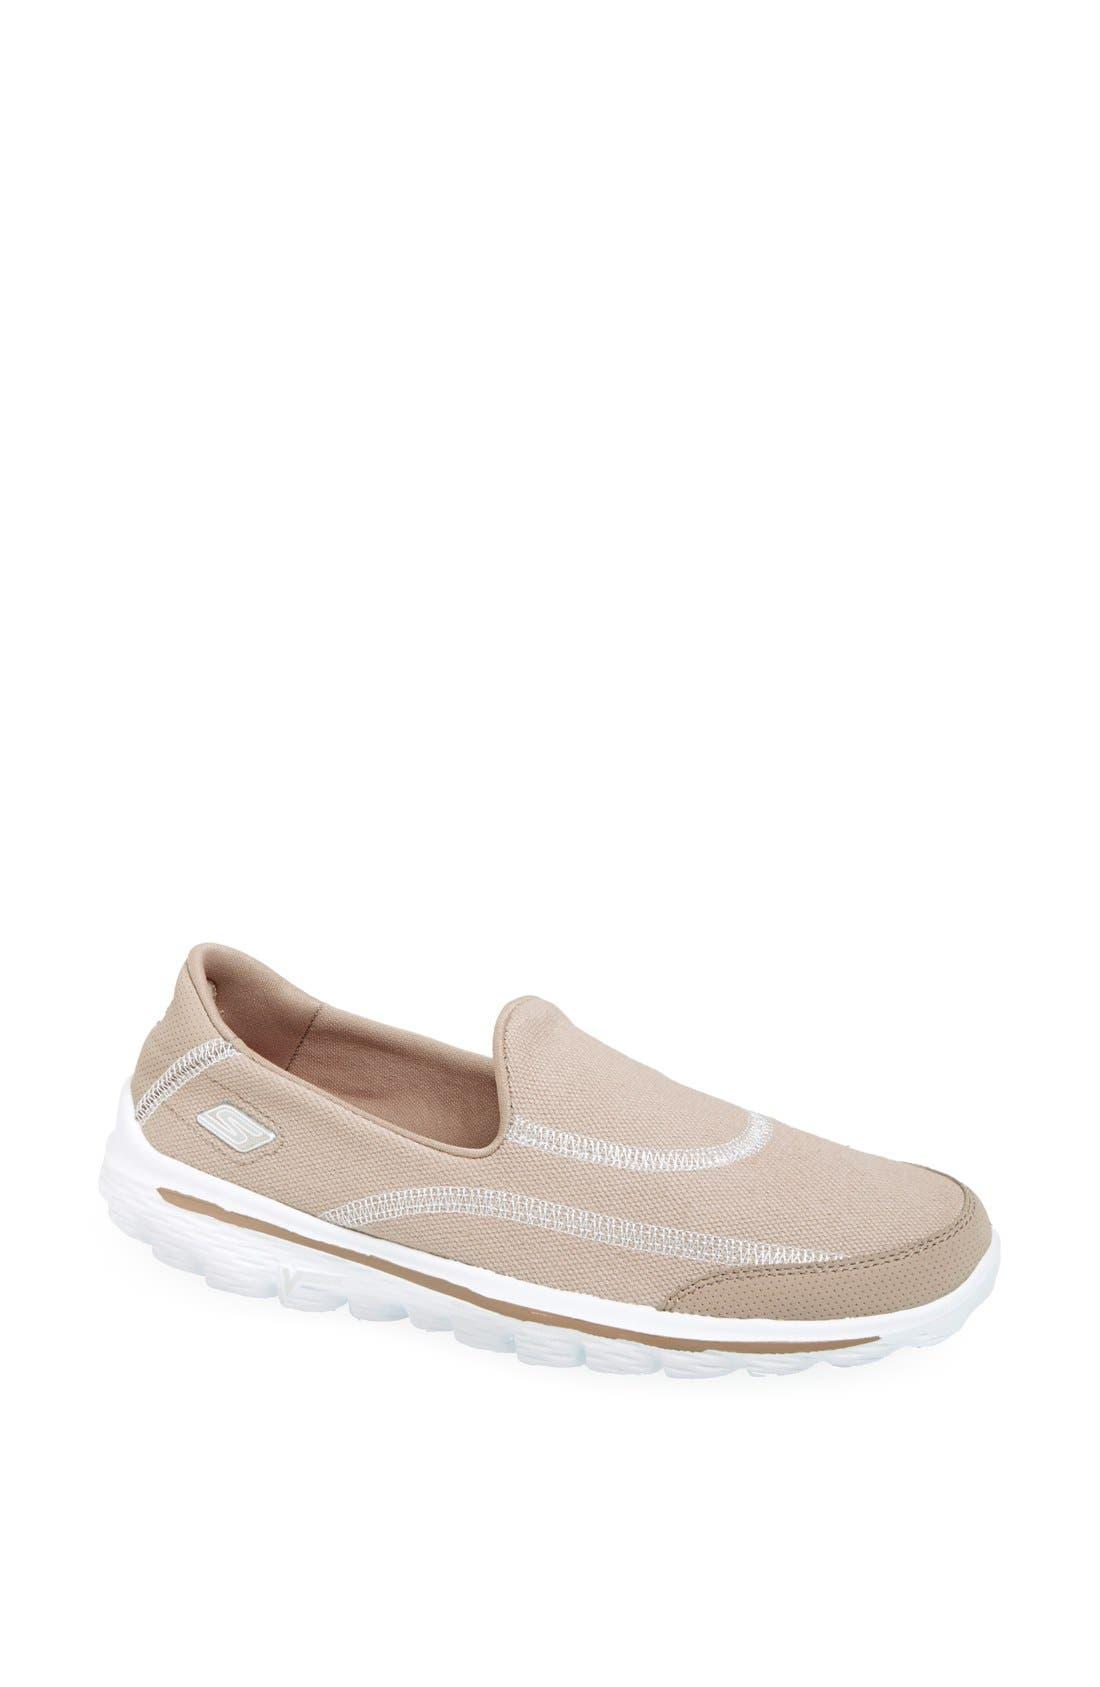 Alternate Image 1 Selected - SKECHERS 'Fresco GO WALK' Slip-On Walking Shoe (Women)